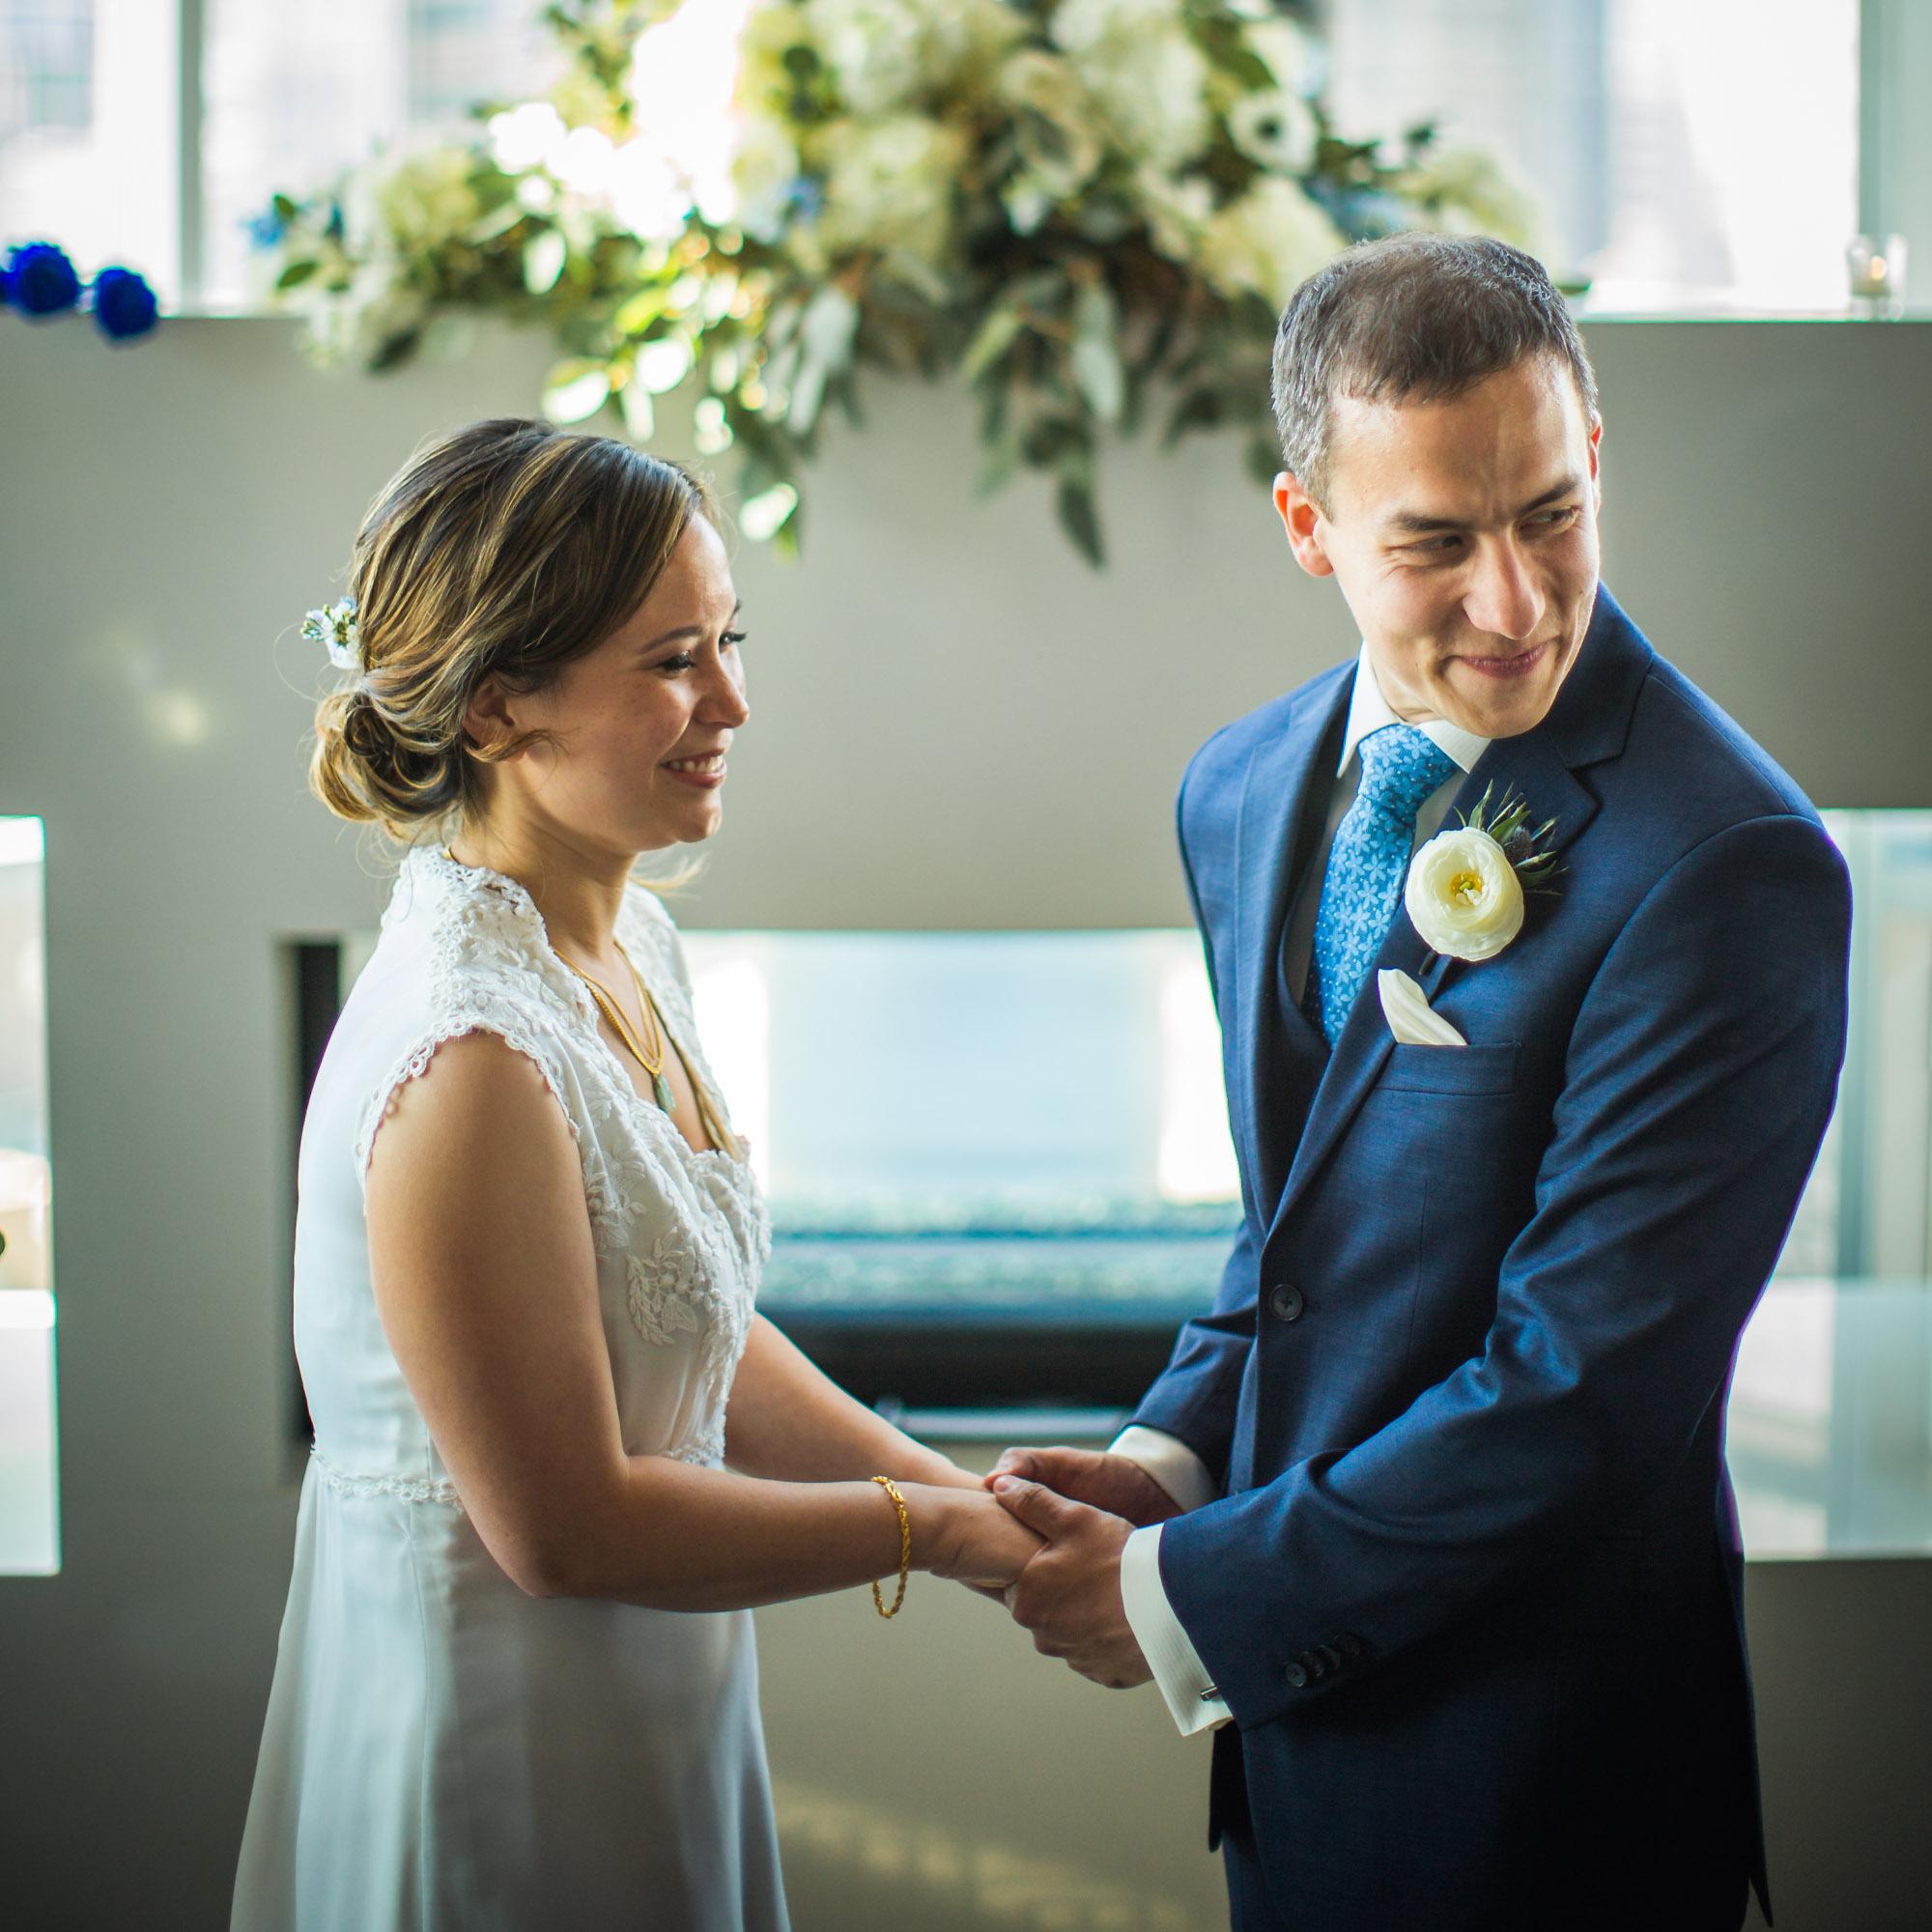 lam-chicago-wedding-photos-19.jpg